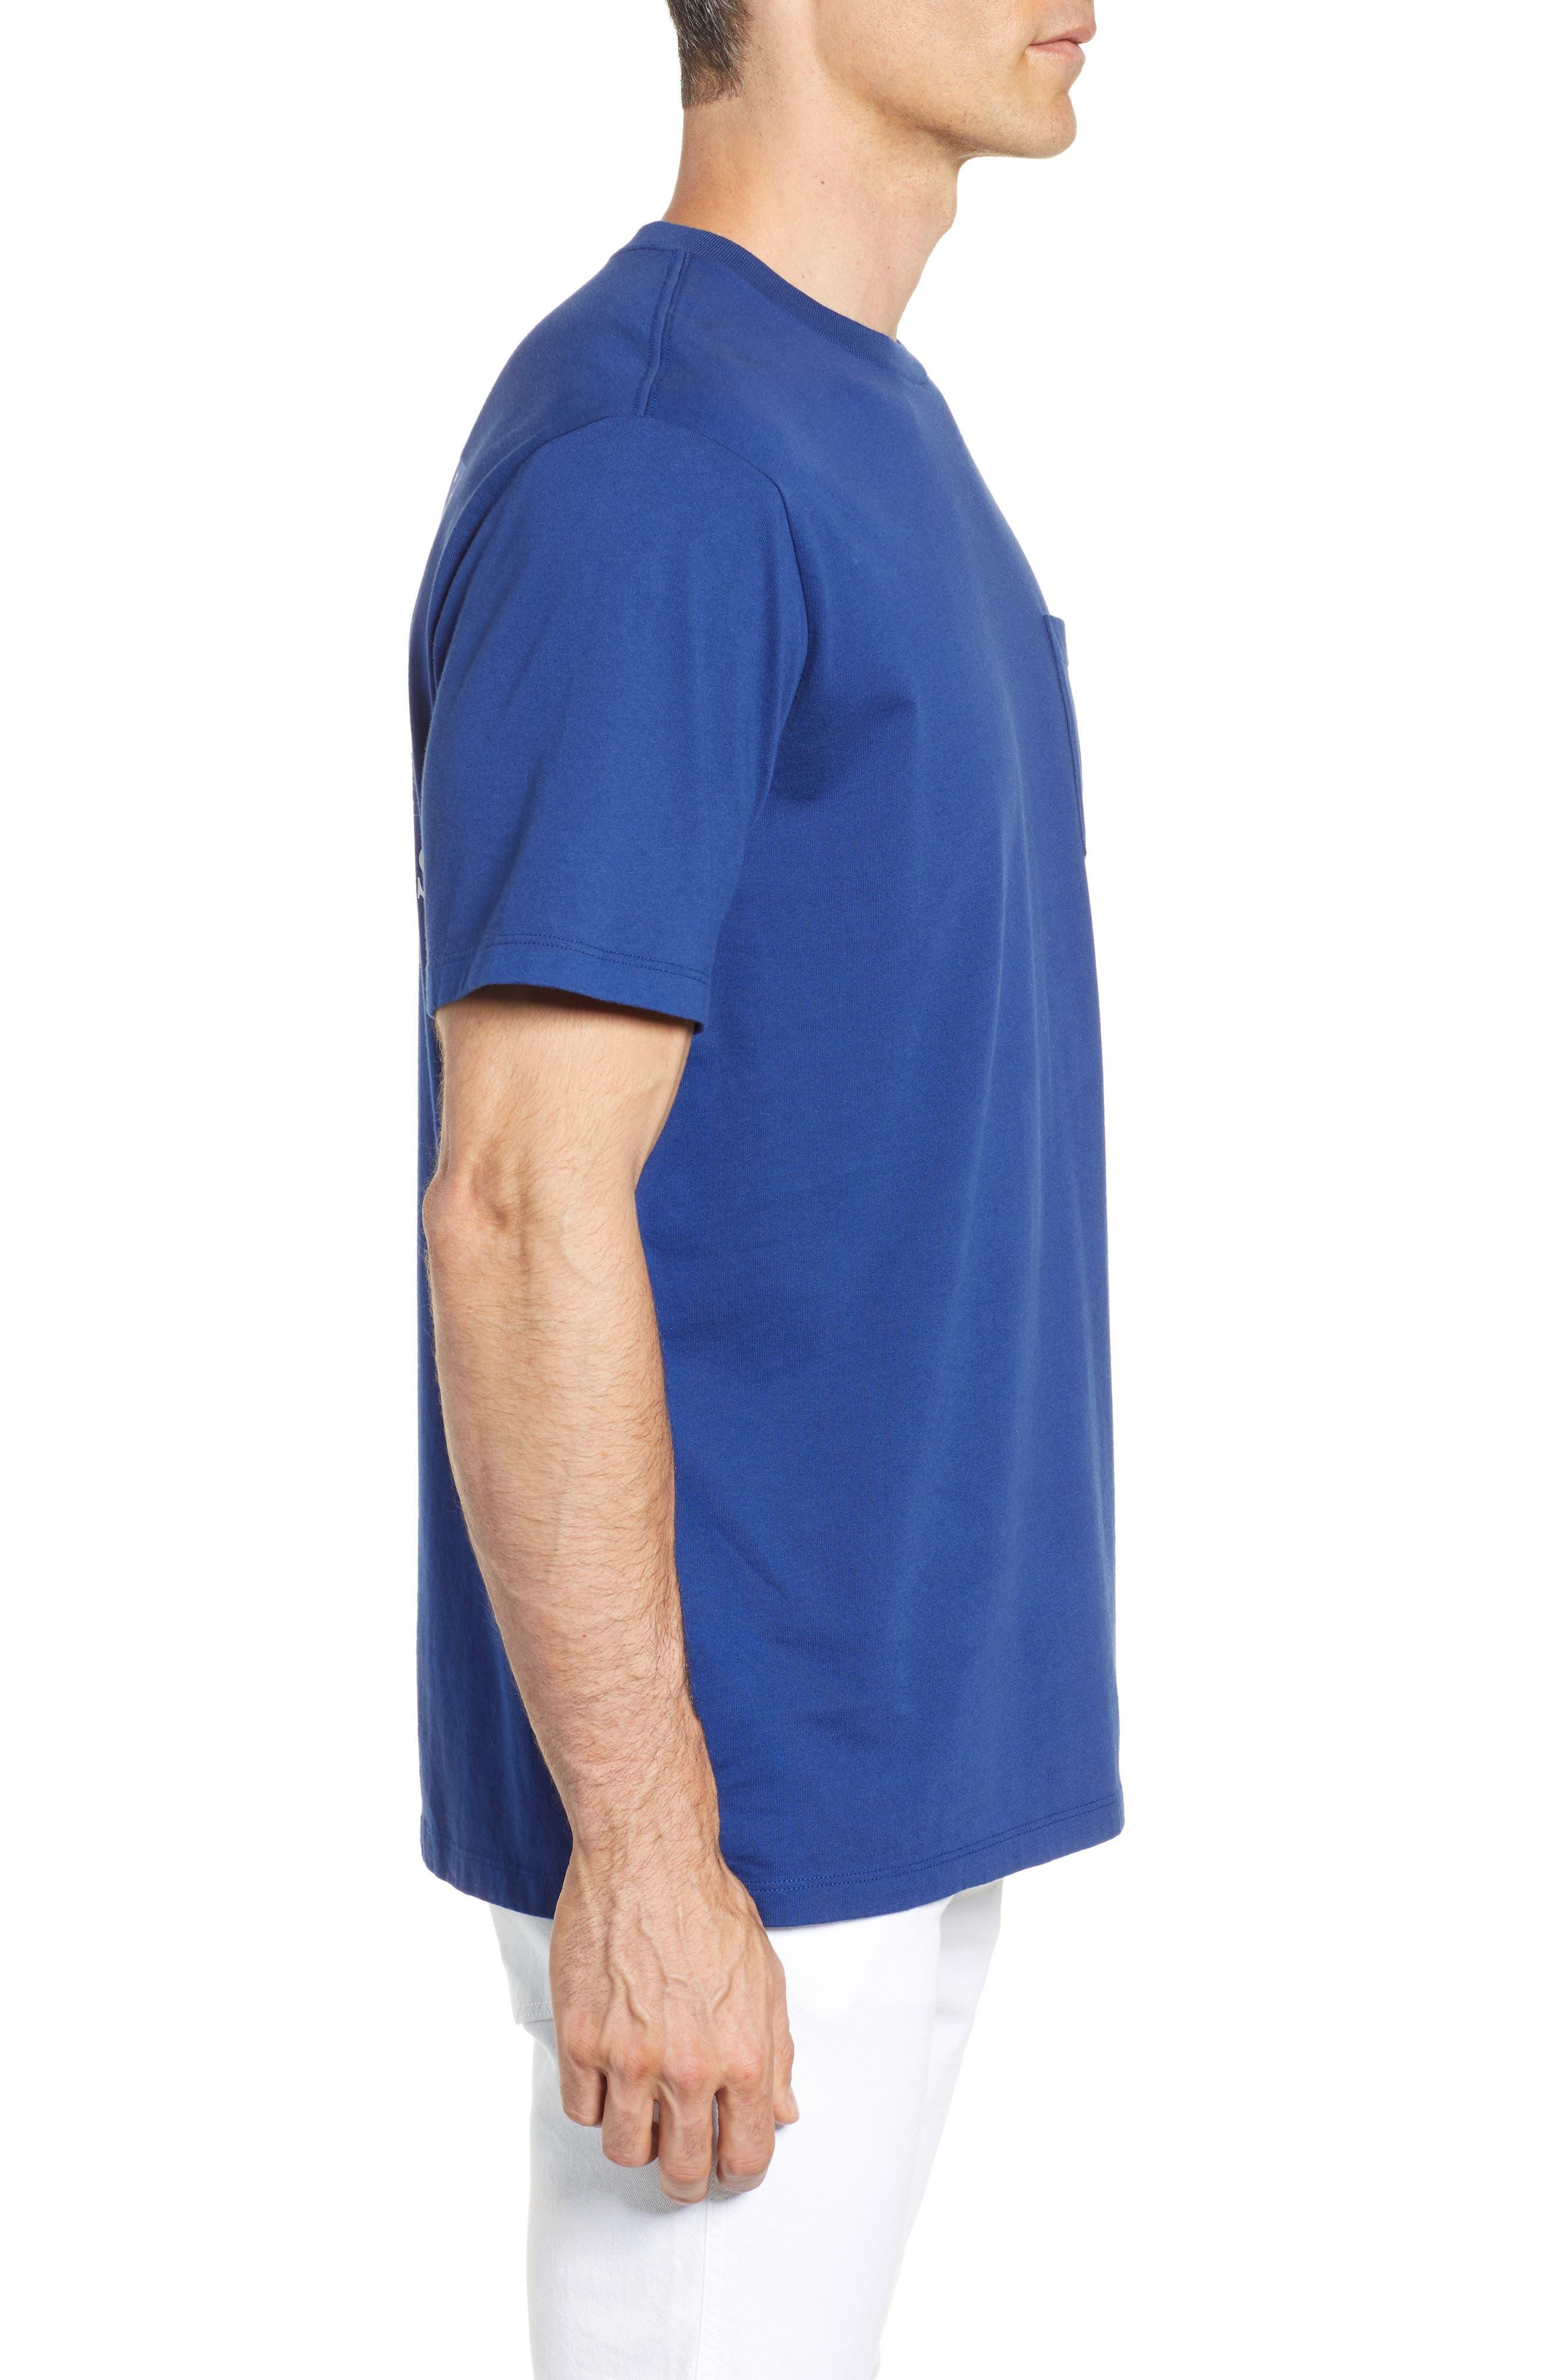 U.S. Tradition Pocket T-Shirt,                             Alternate thumbnail 3, color,                             400